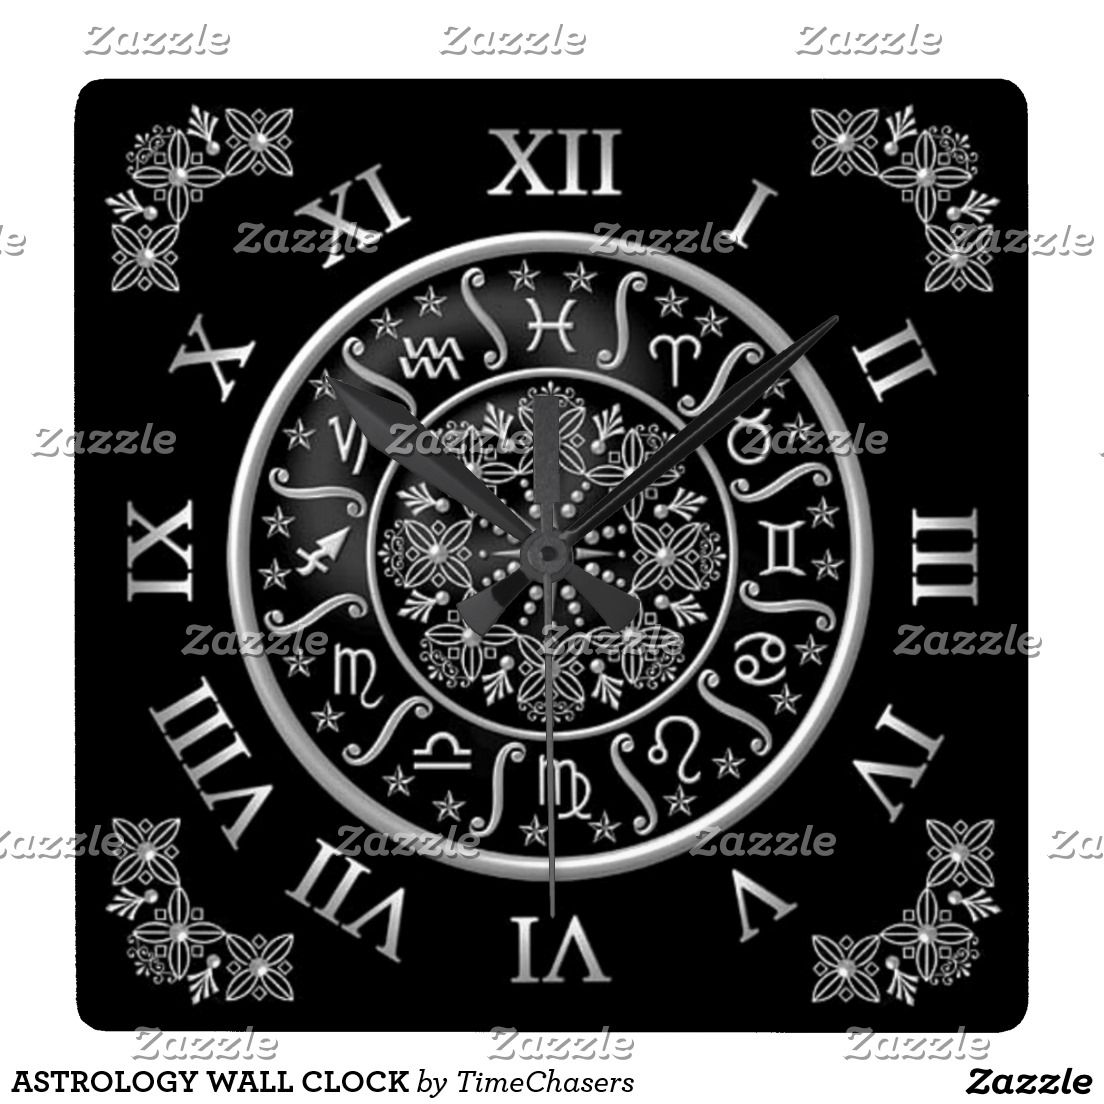 Astrology Wall Clock Zazzle Com Clock Face Printable Clock Clock Face